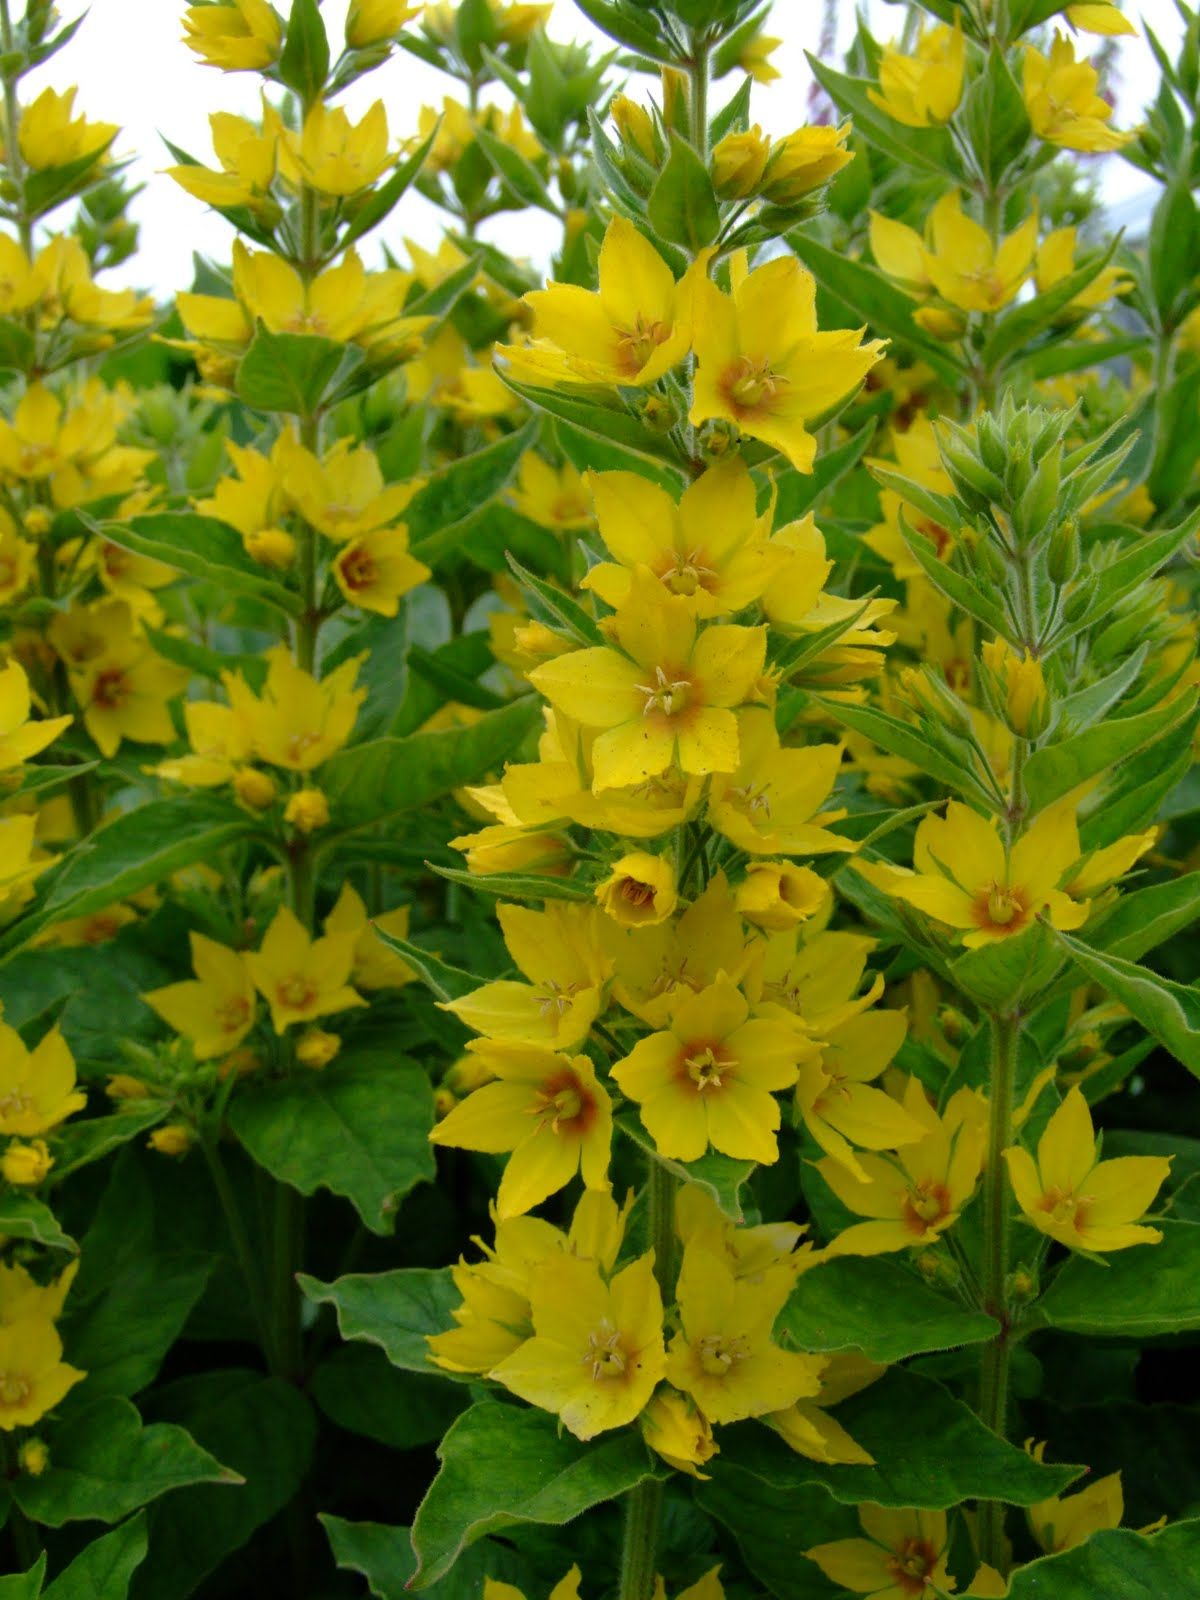 Wederik Tuinplanten Schaduwplanten Tuinplanning